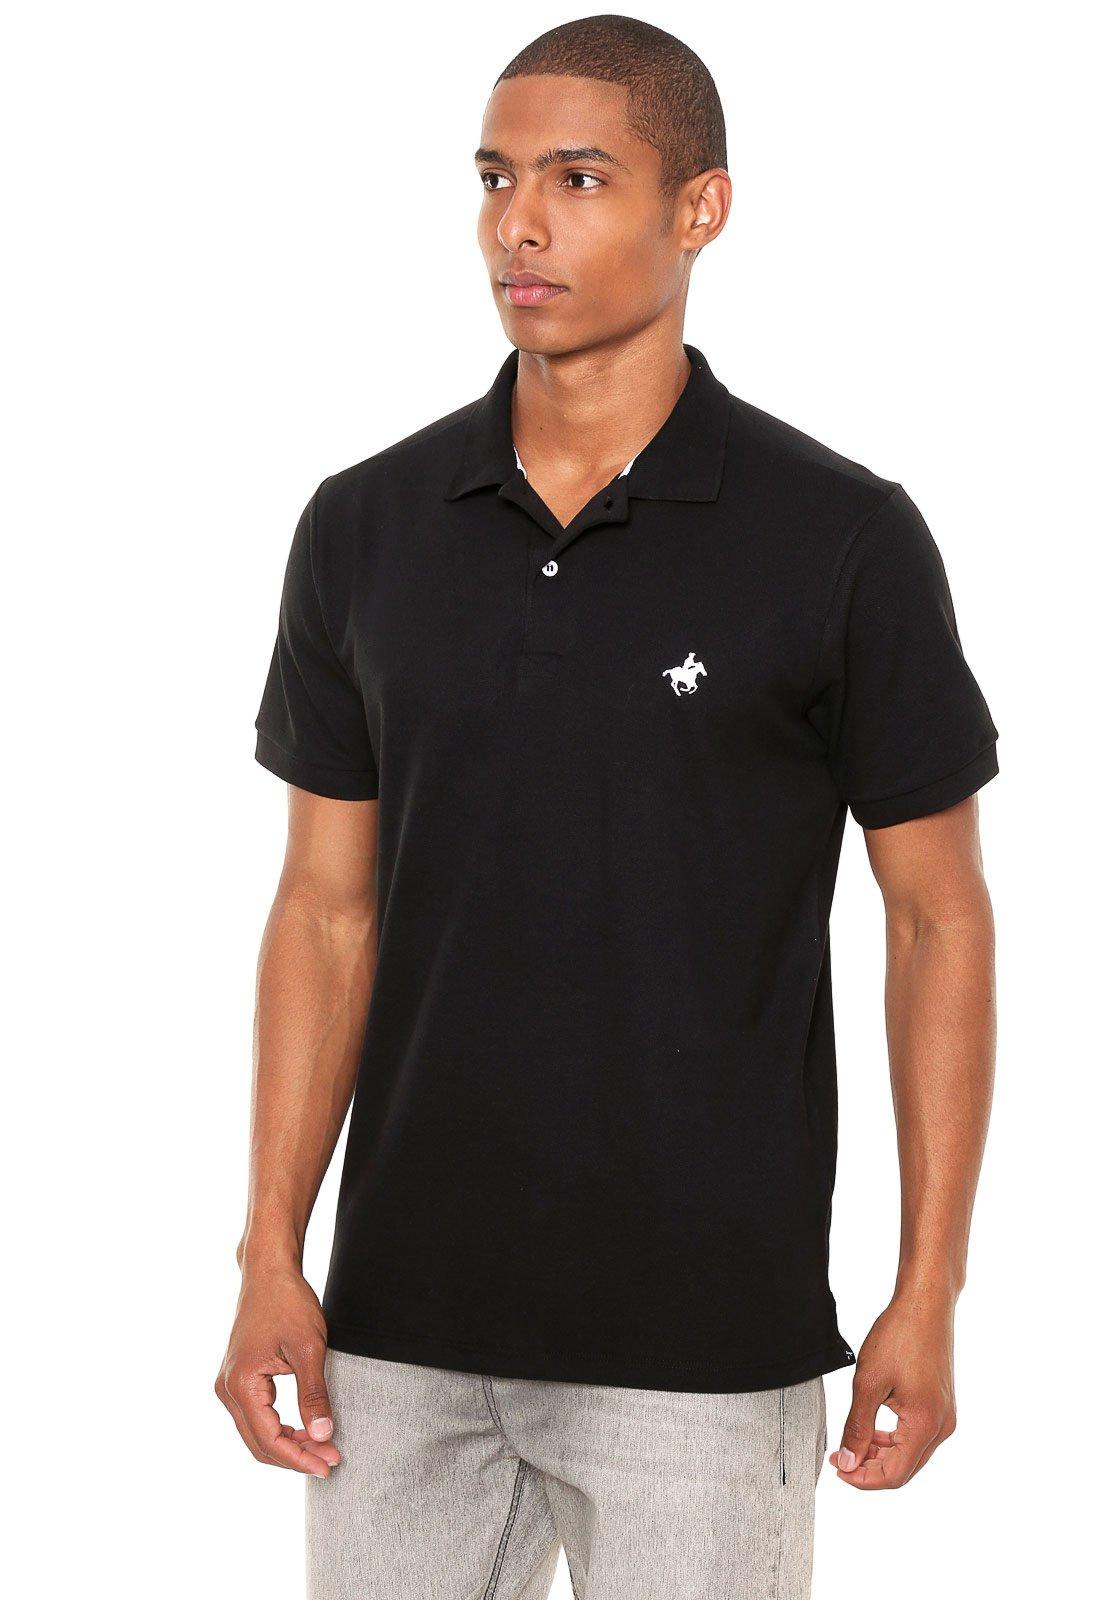 7432da97f3 Camisa Polo Monte Carlo Polo Club Bordado Preta - Compre Agora ...